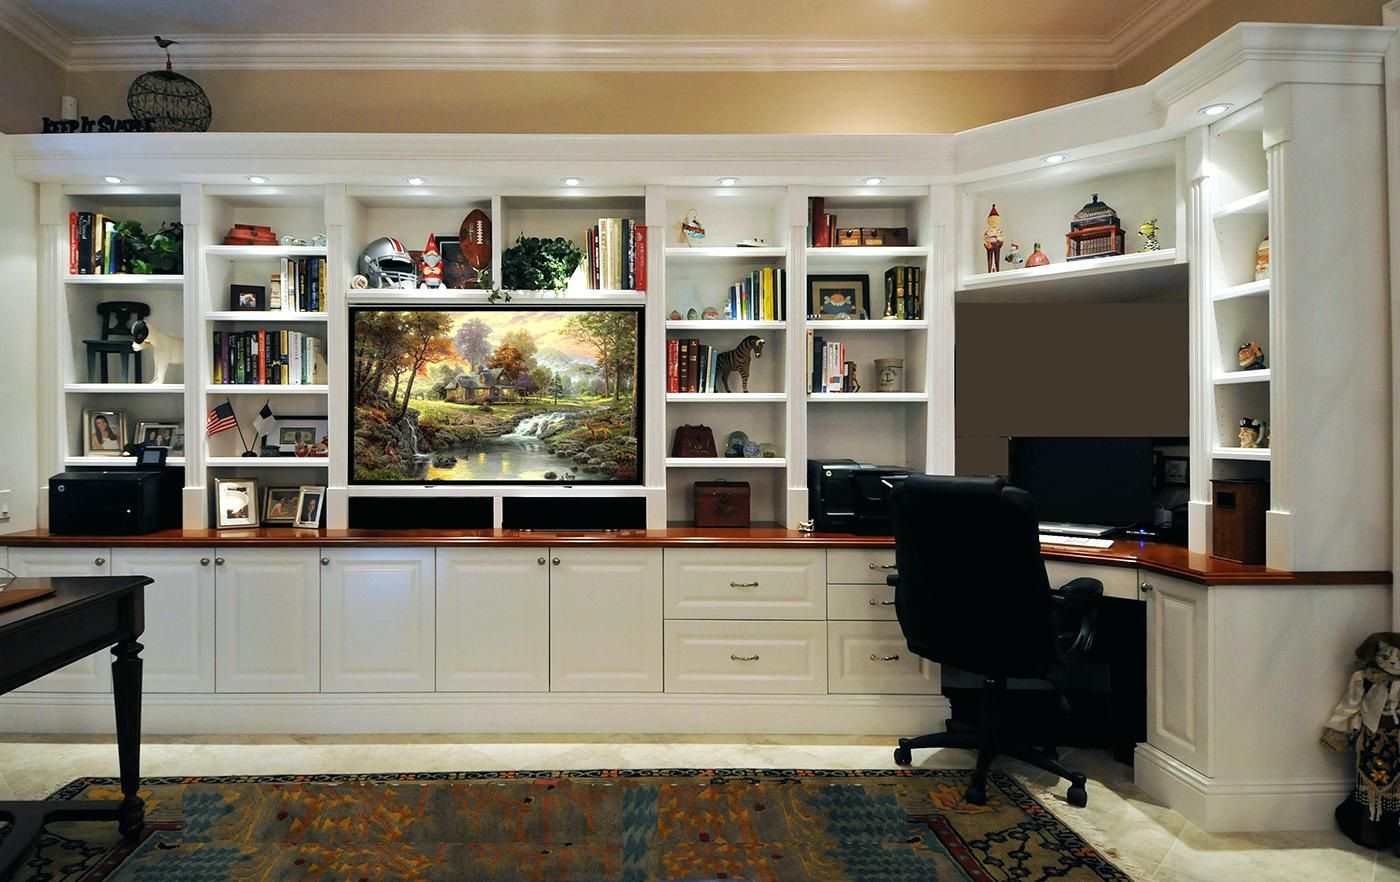 Office Corner Desk Units   Large Home Office Furniture Check More At  Http://michael Malarkey.com/office Corner Desk Units/